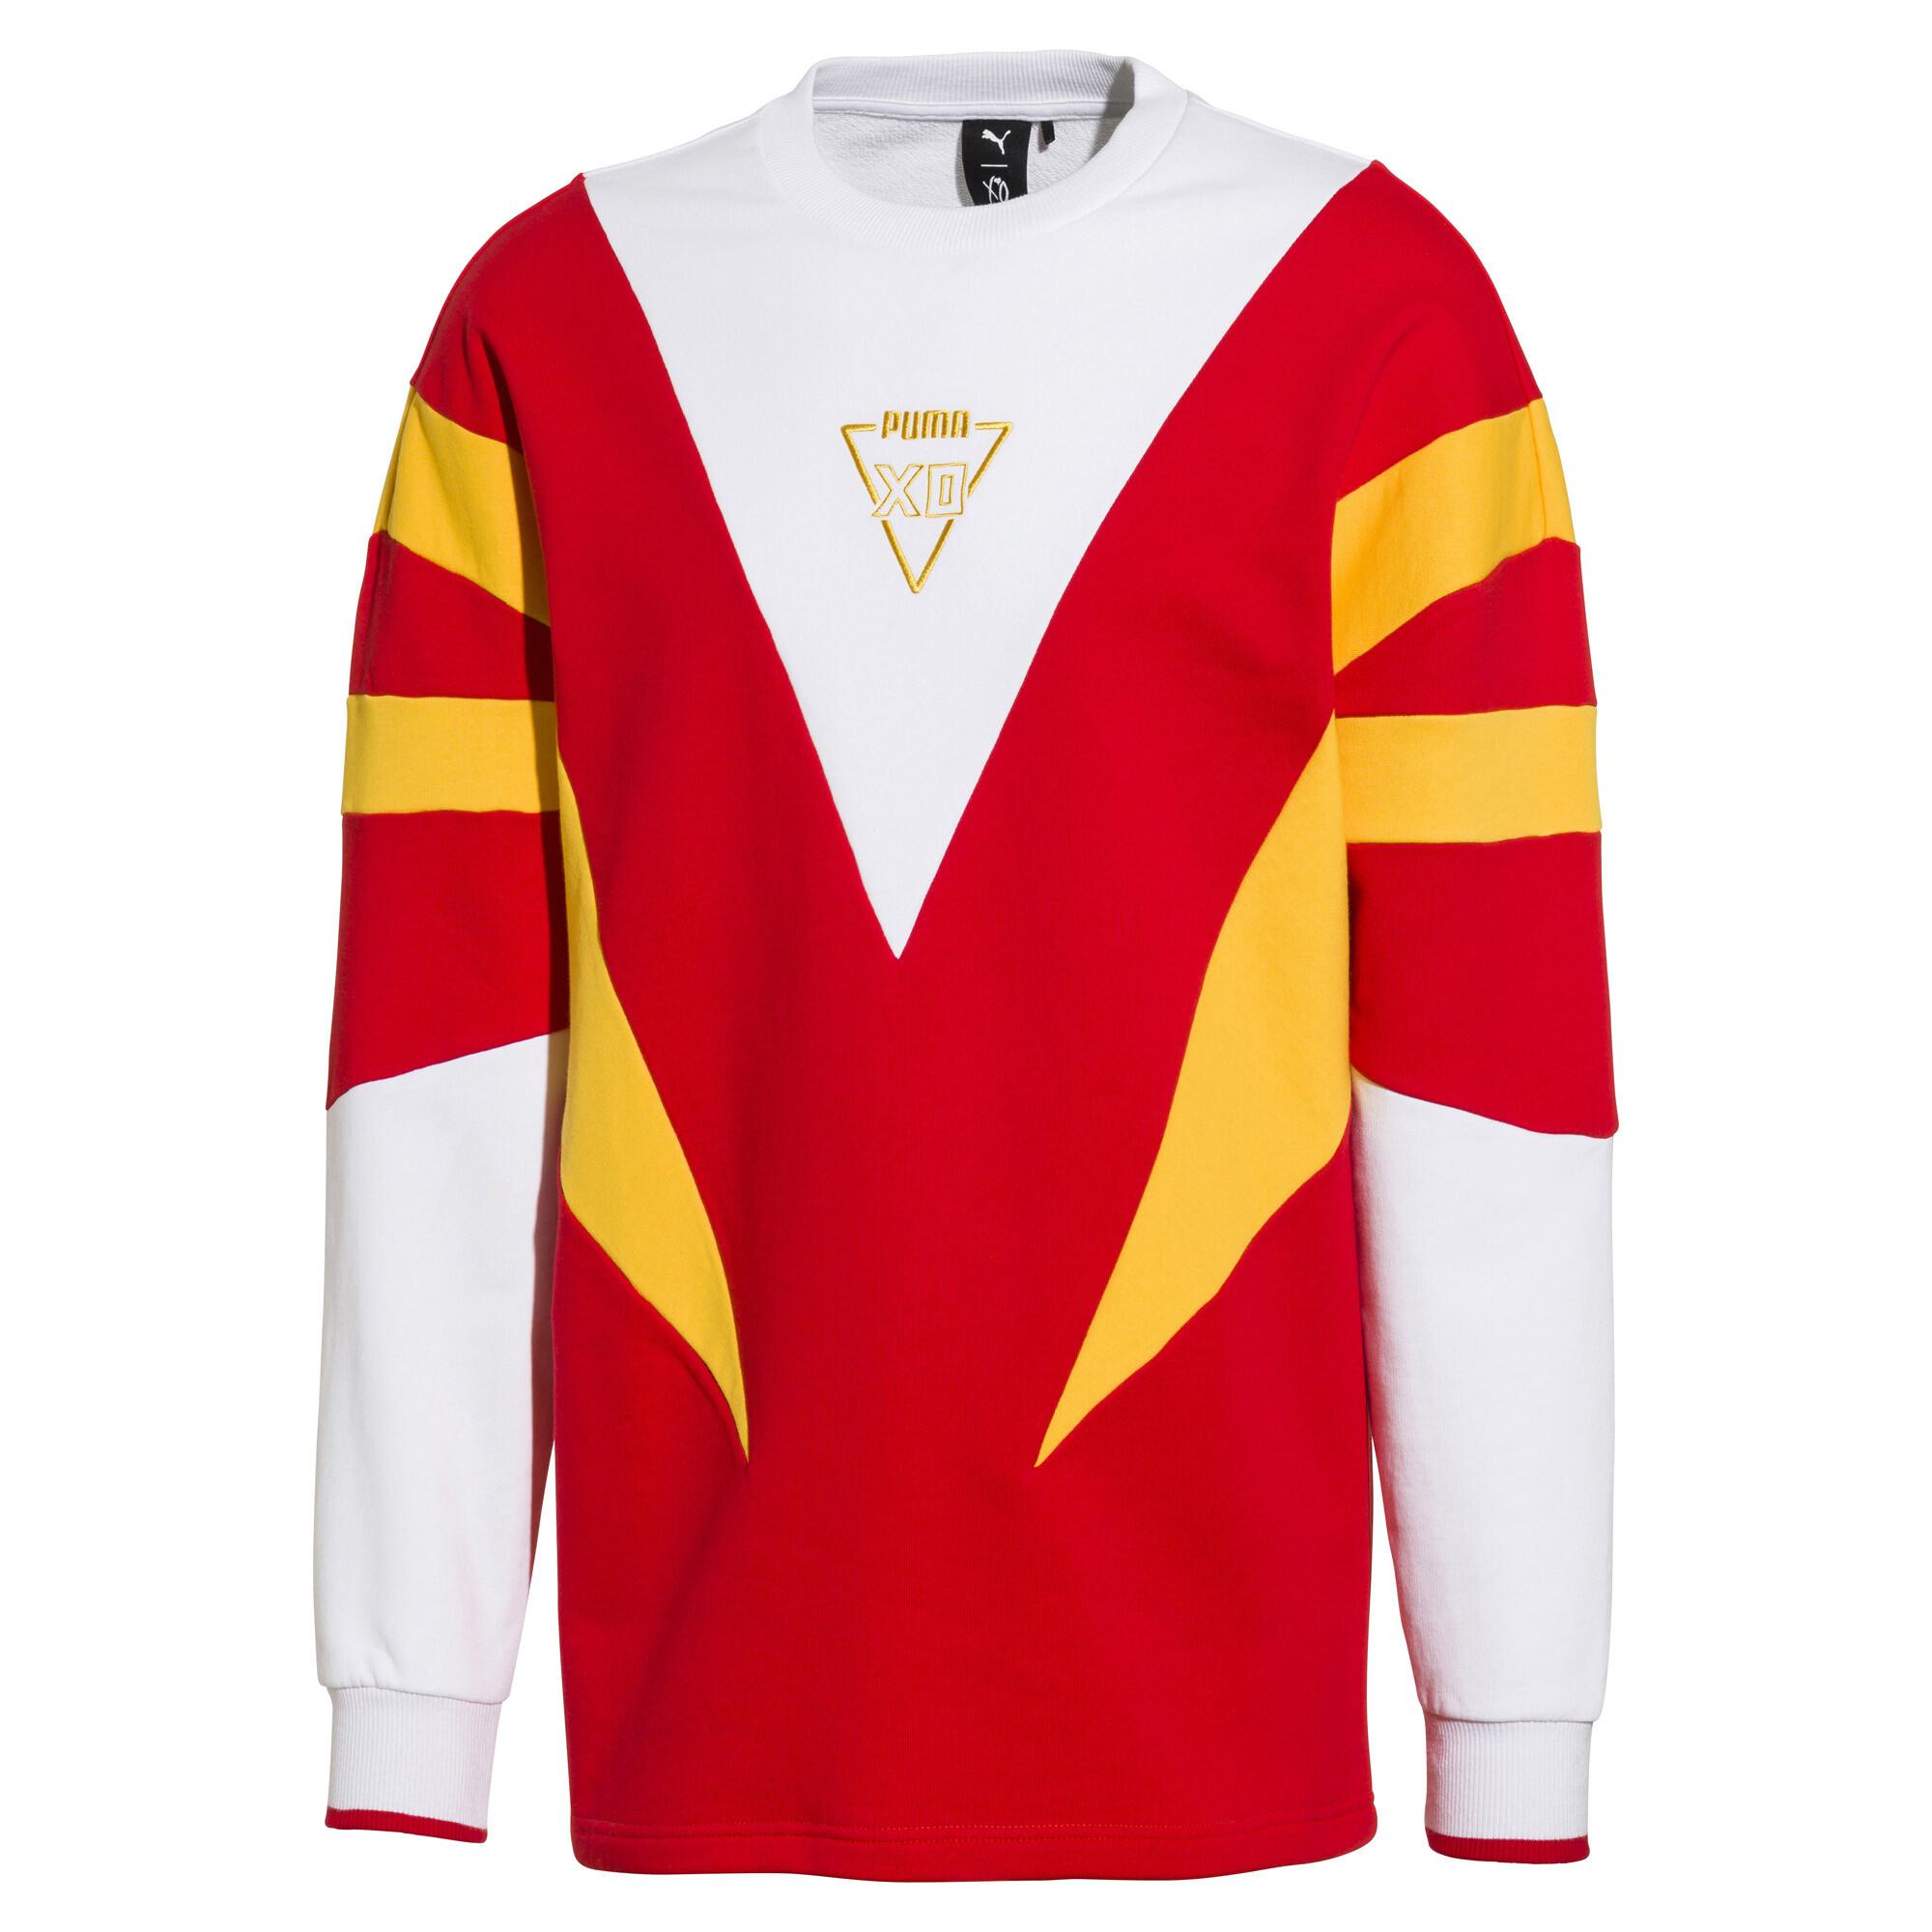 Image Puma PUMA x XO Homage to Archive Men's Sweater #1